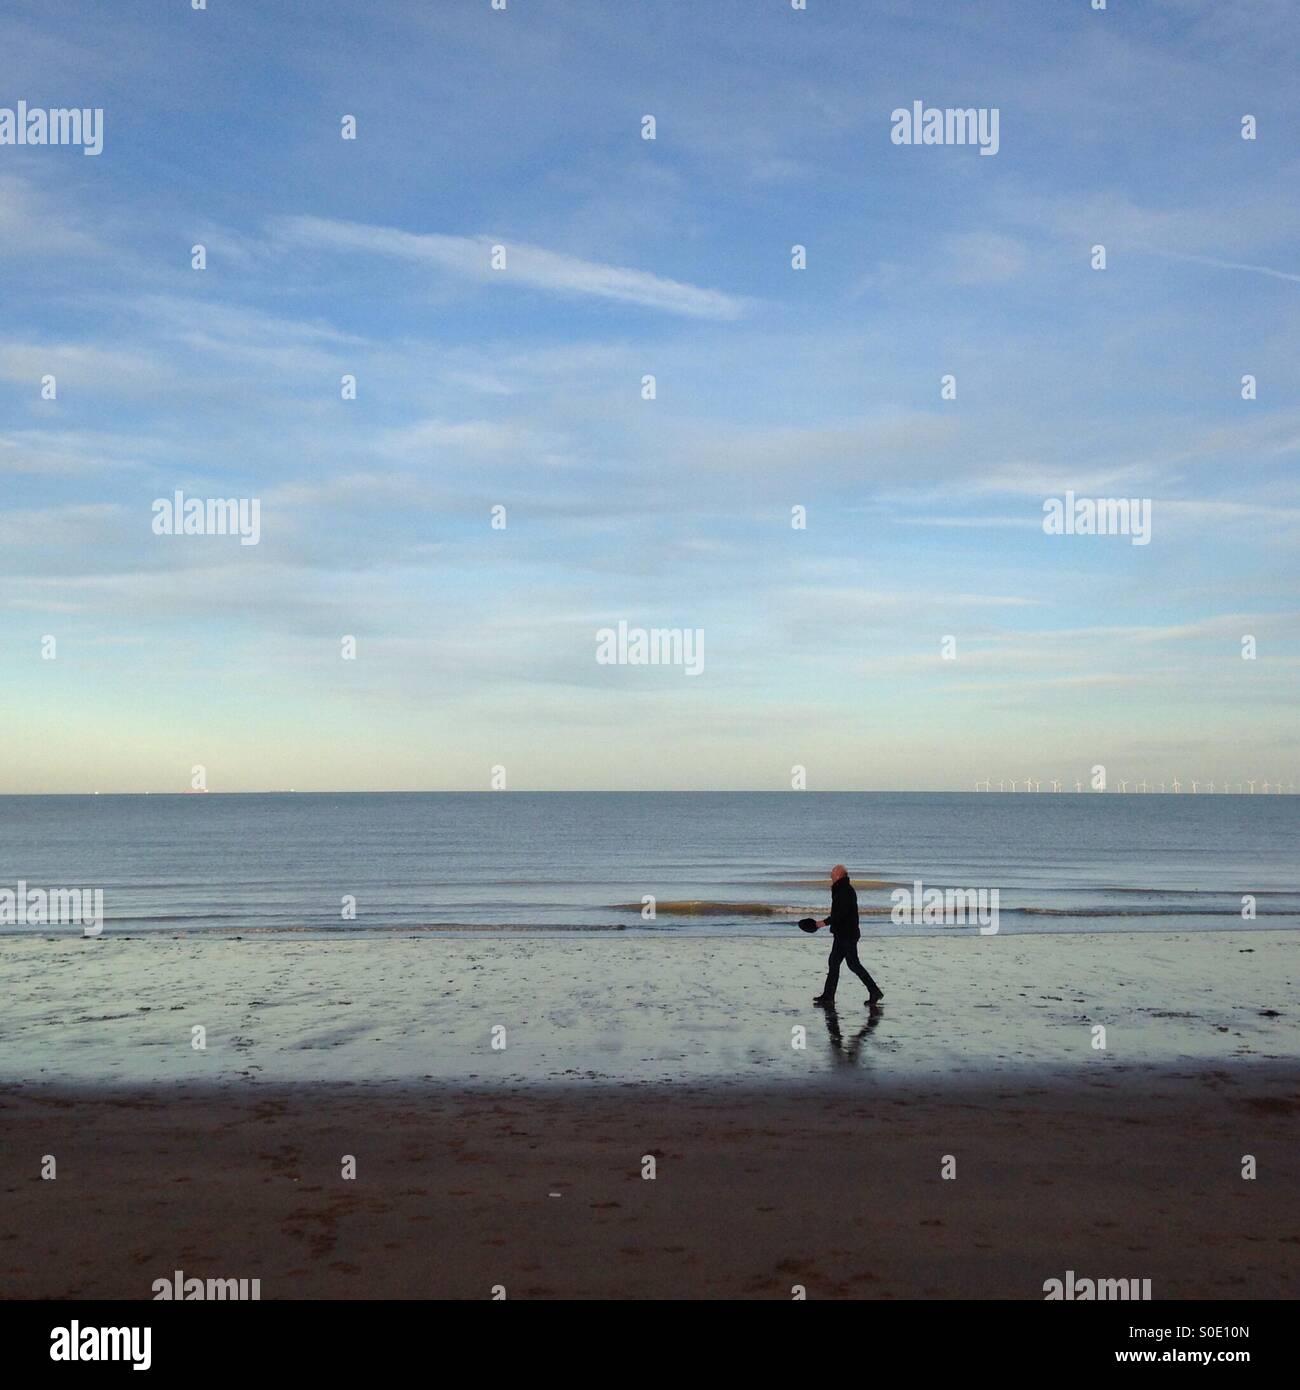 Walking on the beach - Stock Image